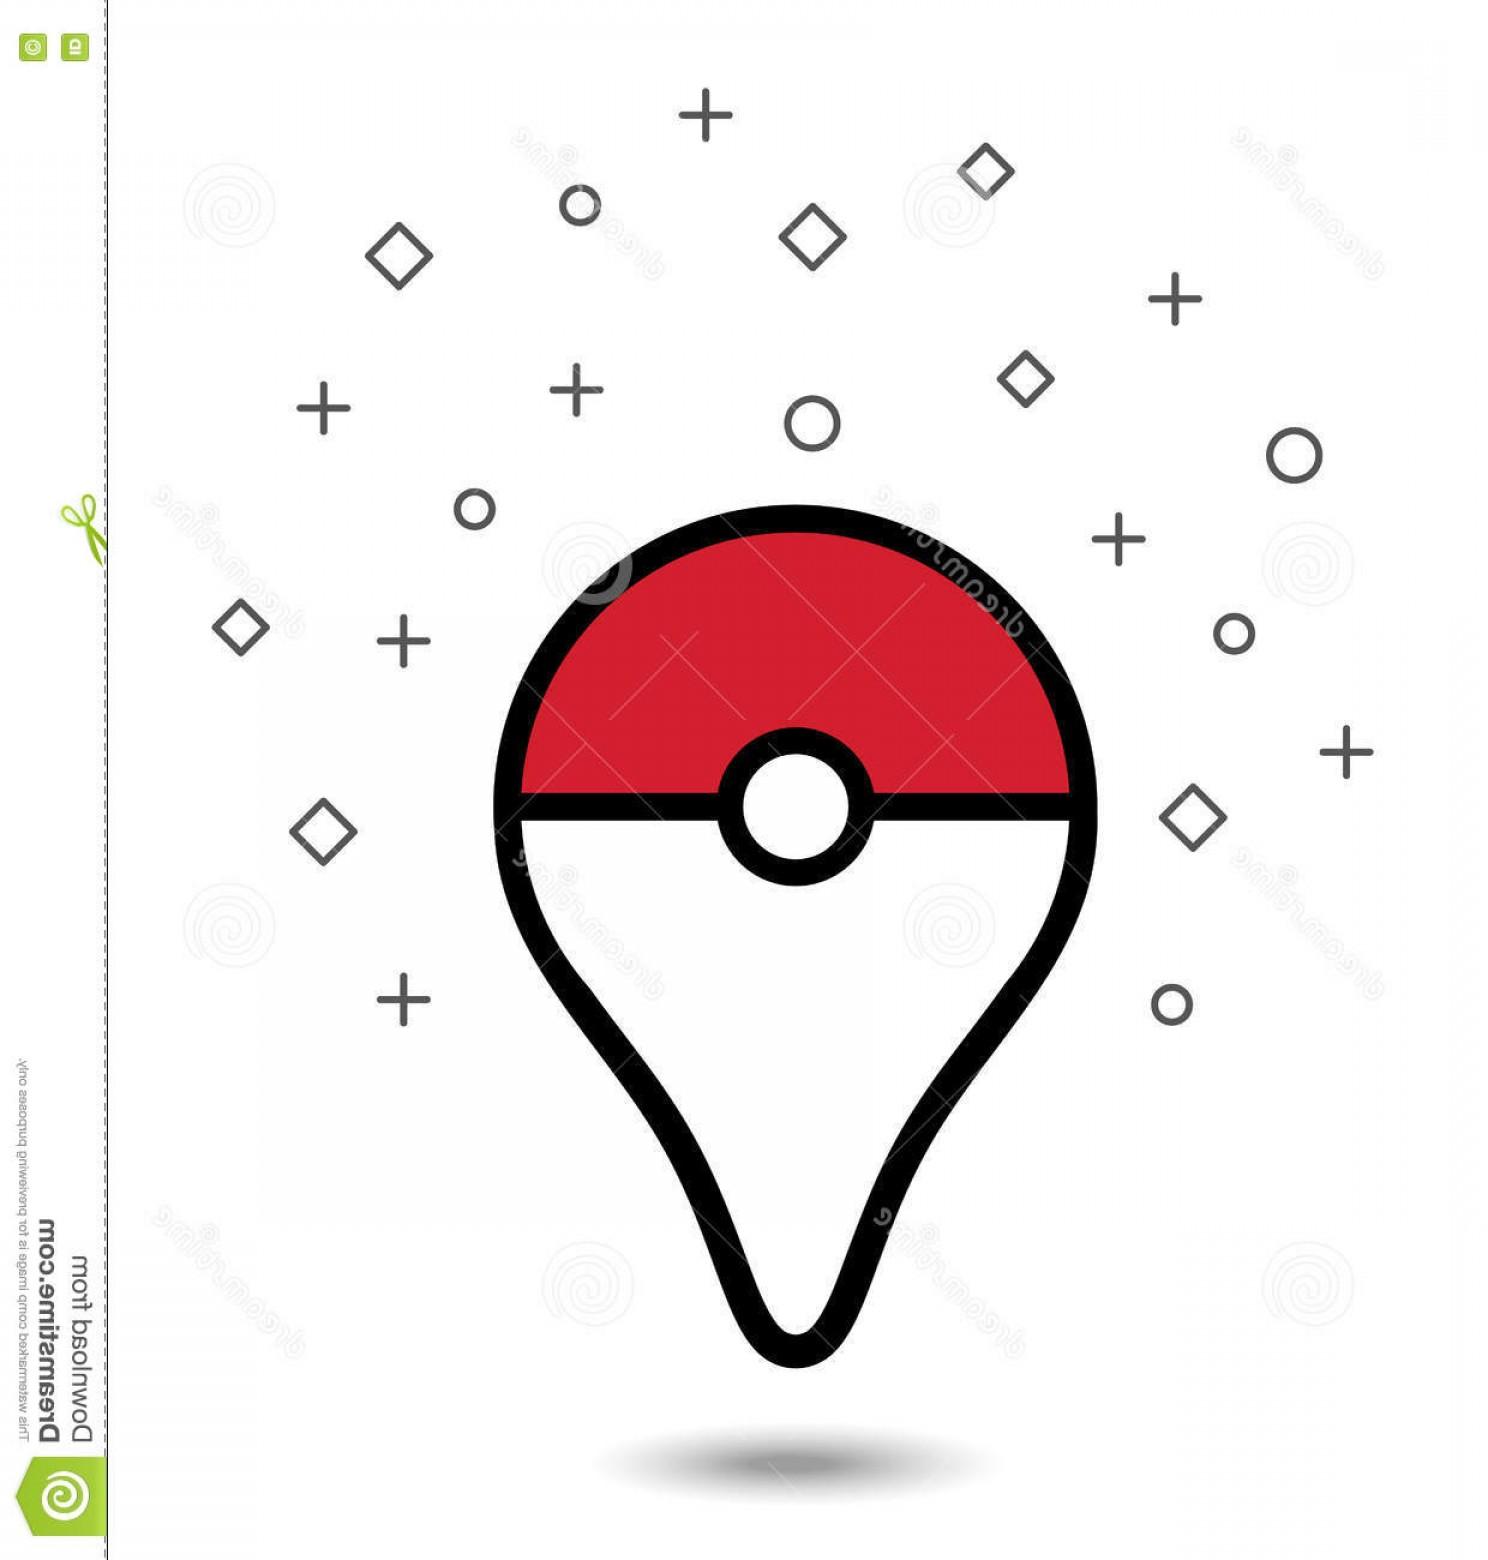 1488x1560 Editorial Stock Photo Vector Pokemon Ball Gray Vignette Background